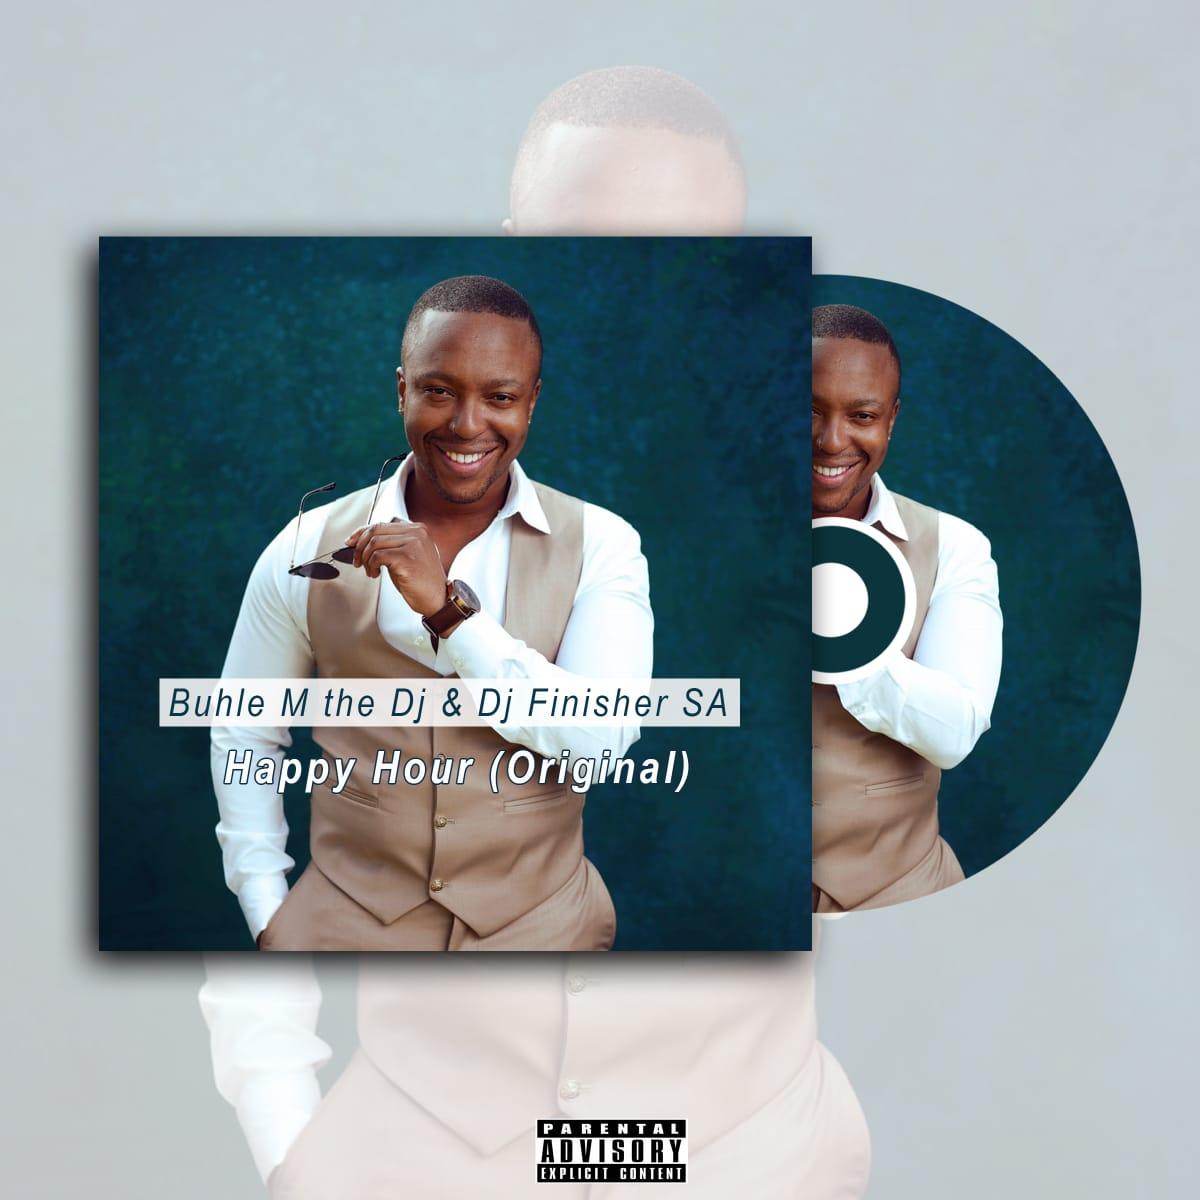 Buhle M The DJ & DJ Finisher SA – Happy Hour